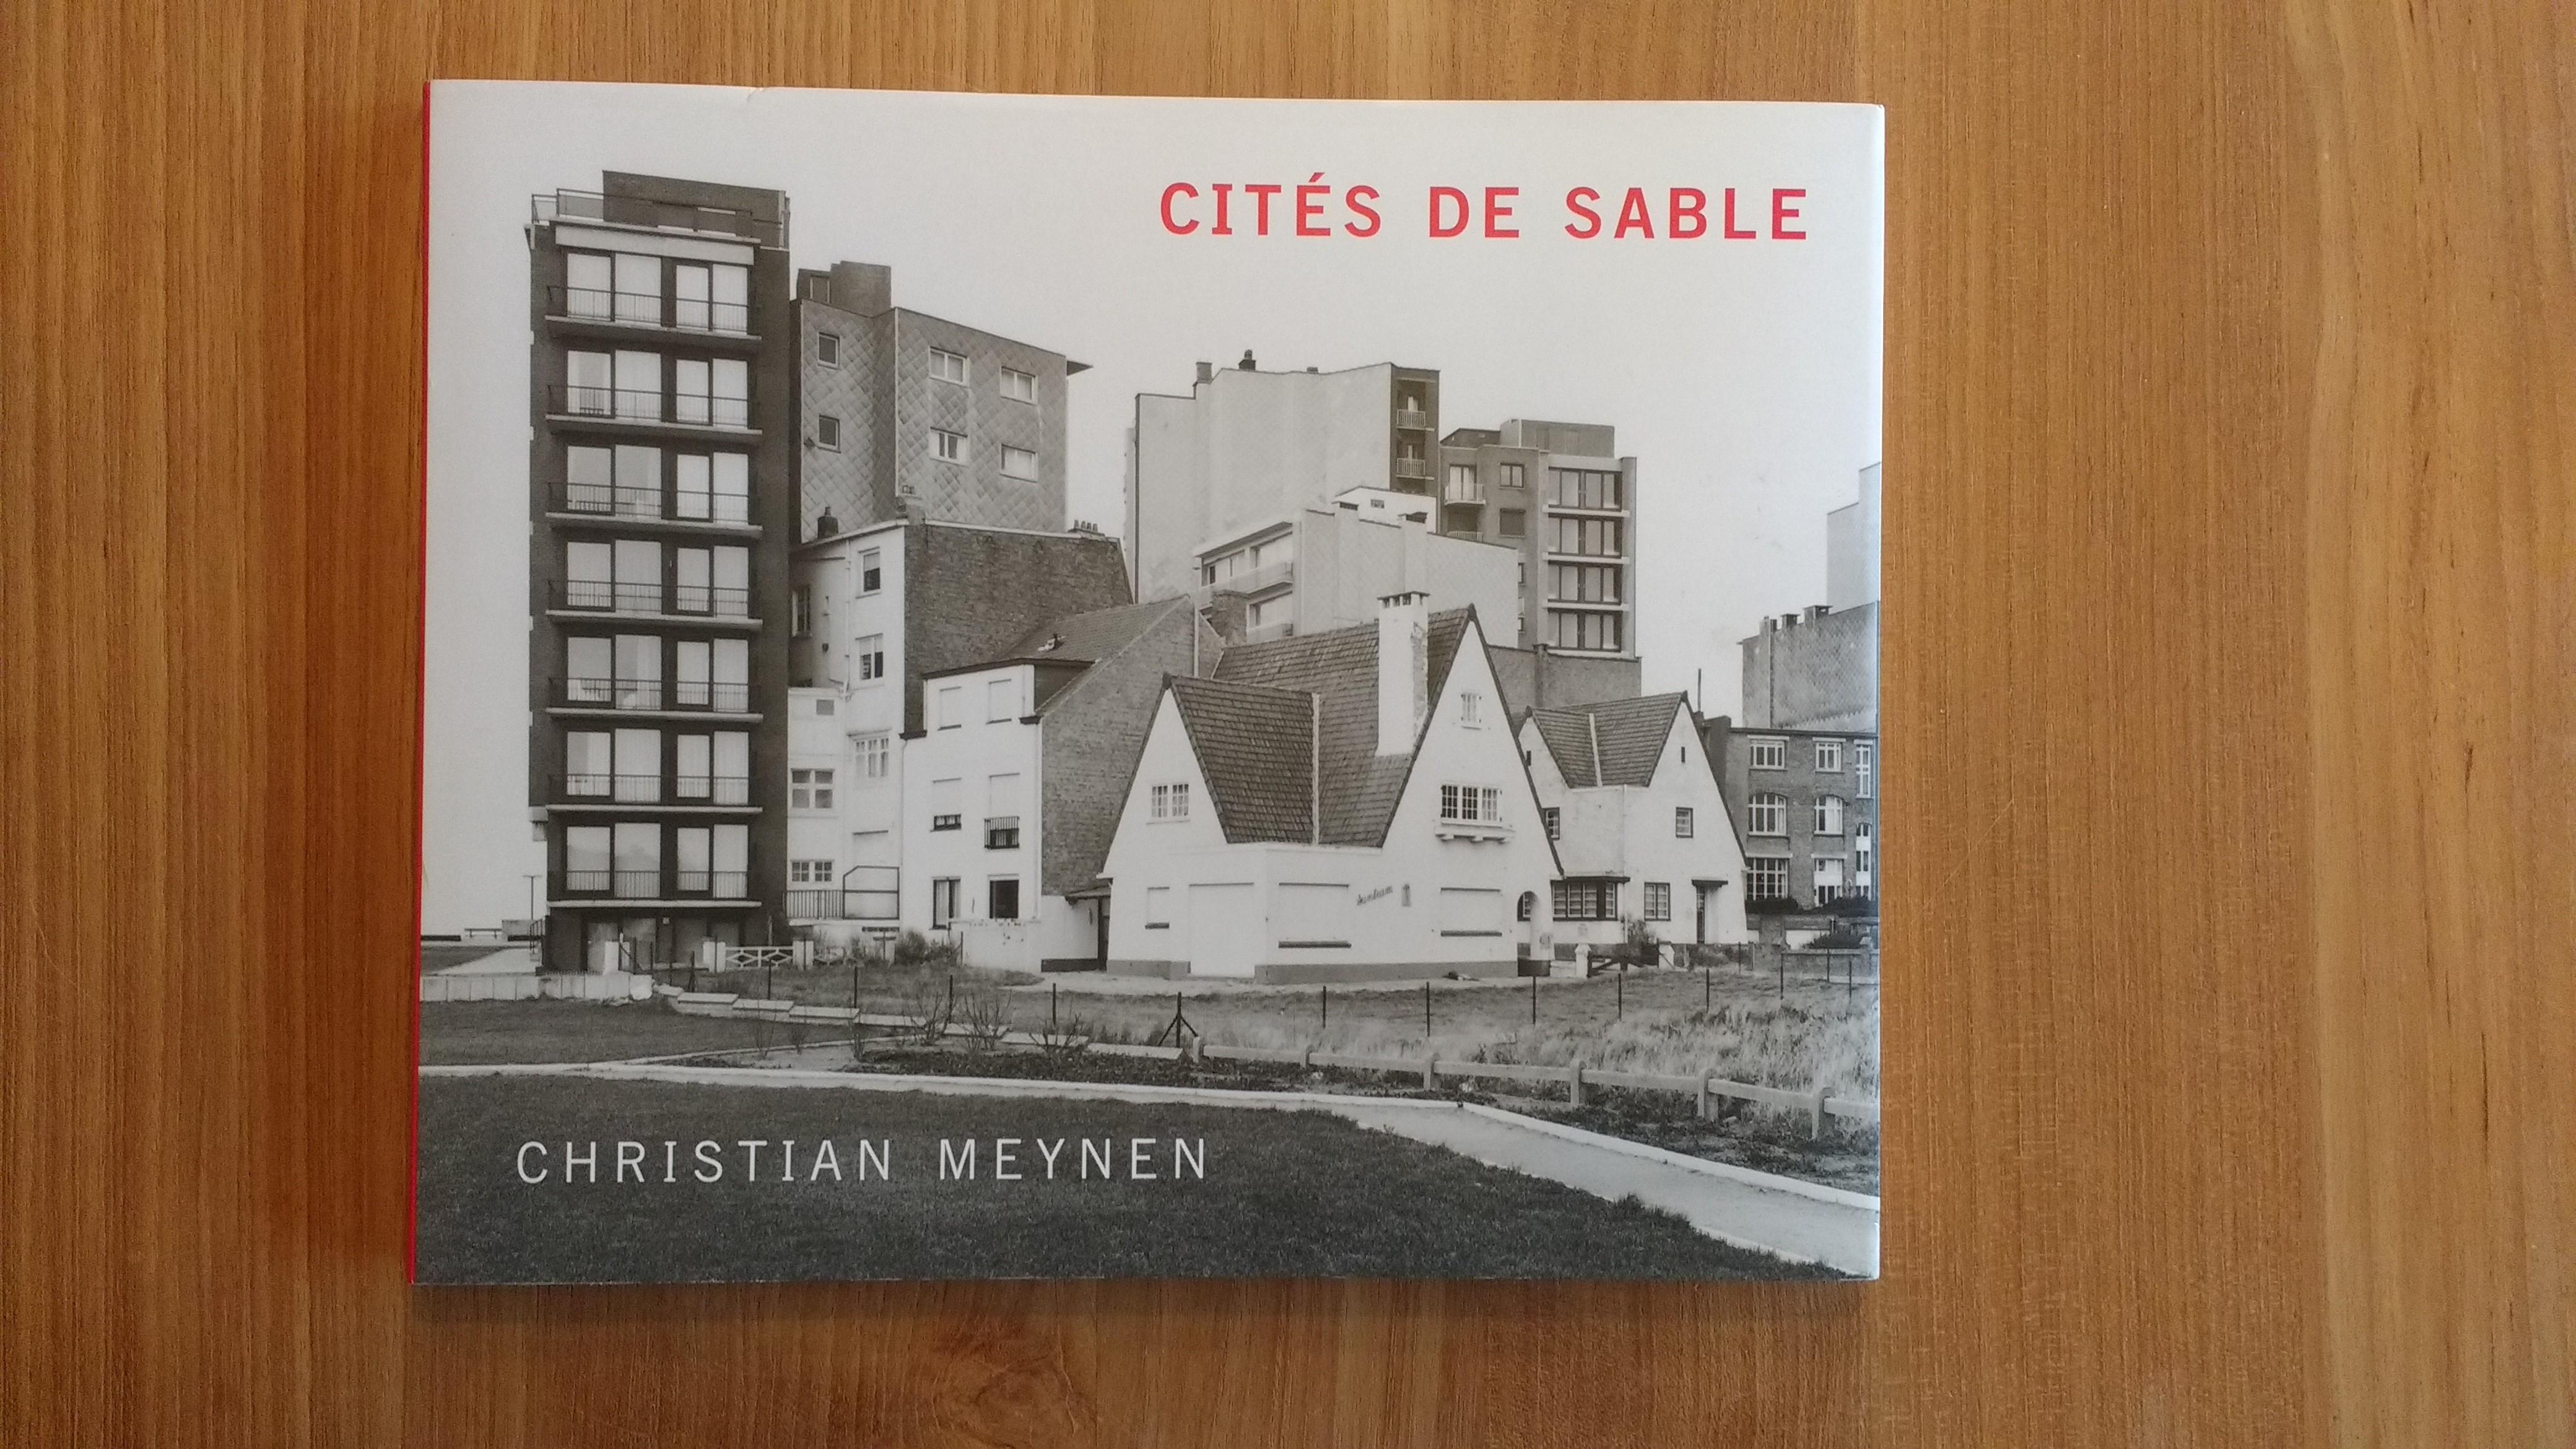 Cités de Sable by Christian Meynen